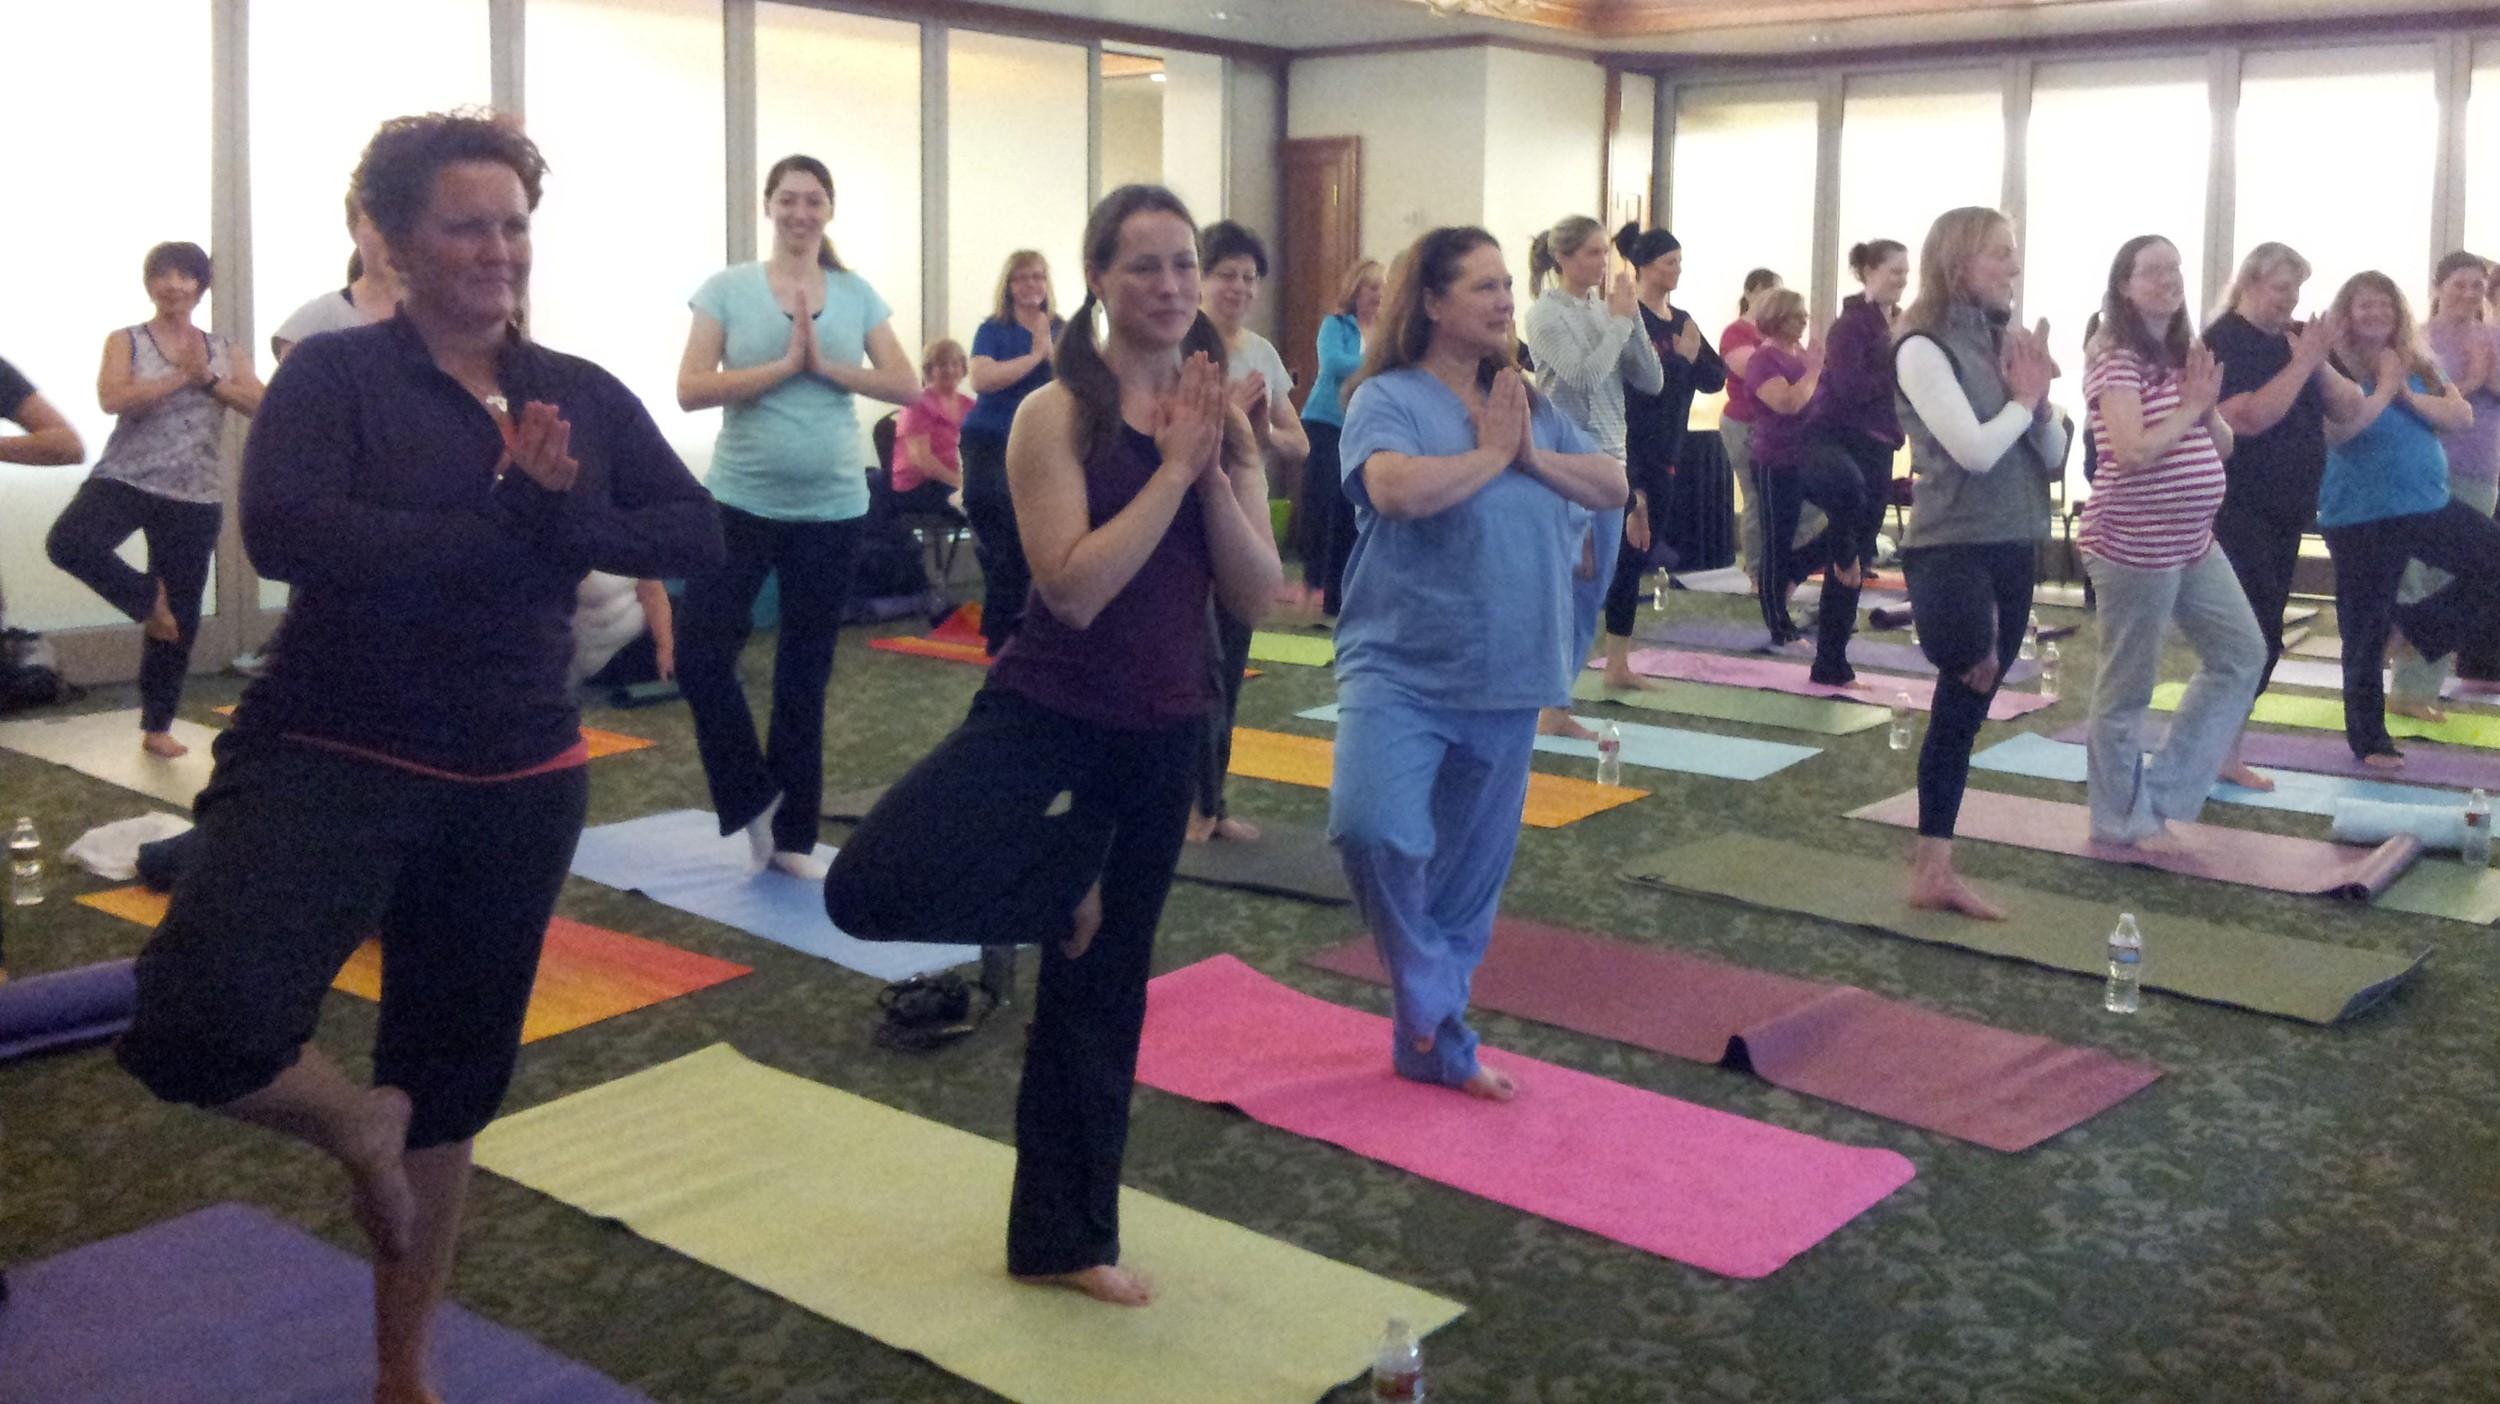 University of Utah Nurses' Retreat